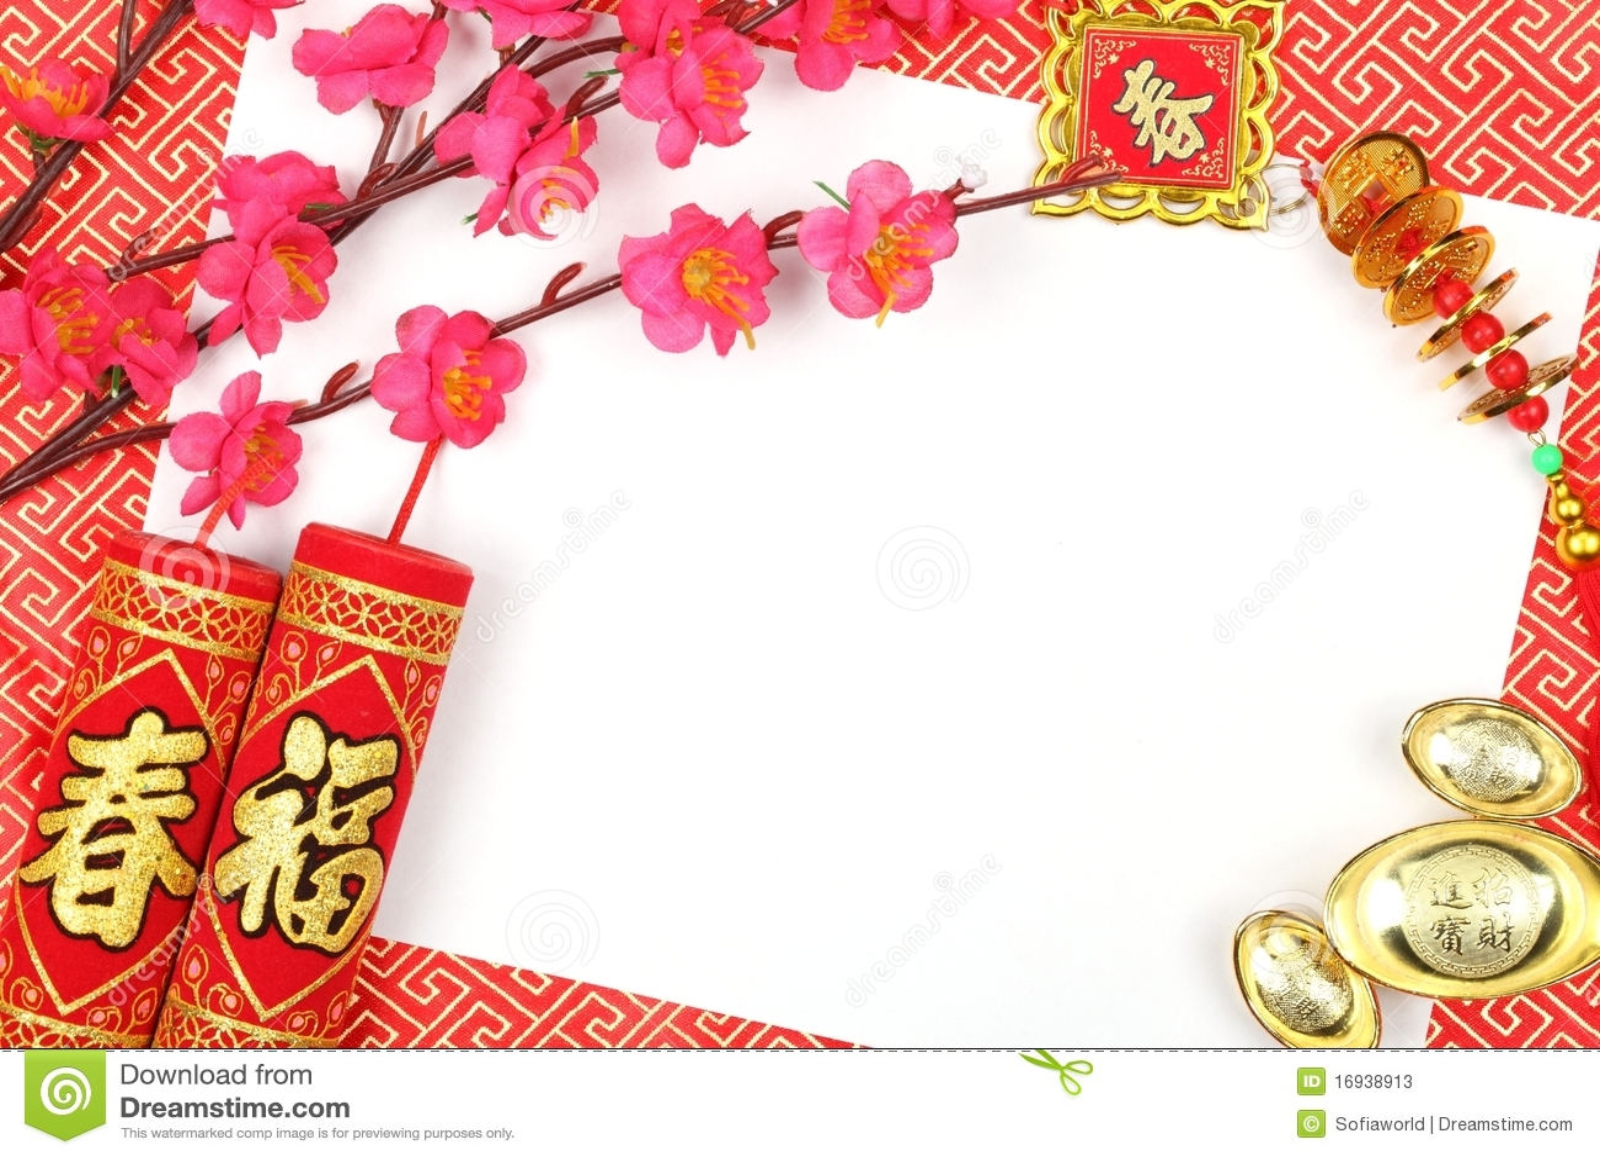 Chinese New Year Decoration Stock Photos - Image: 16938913